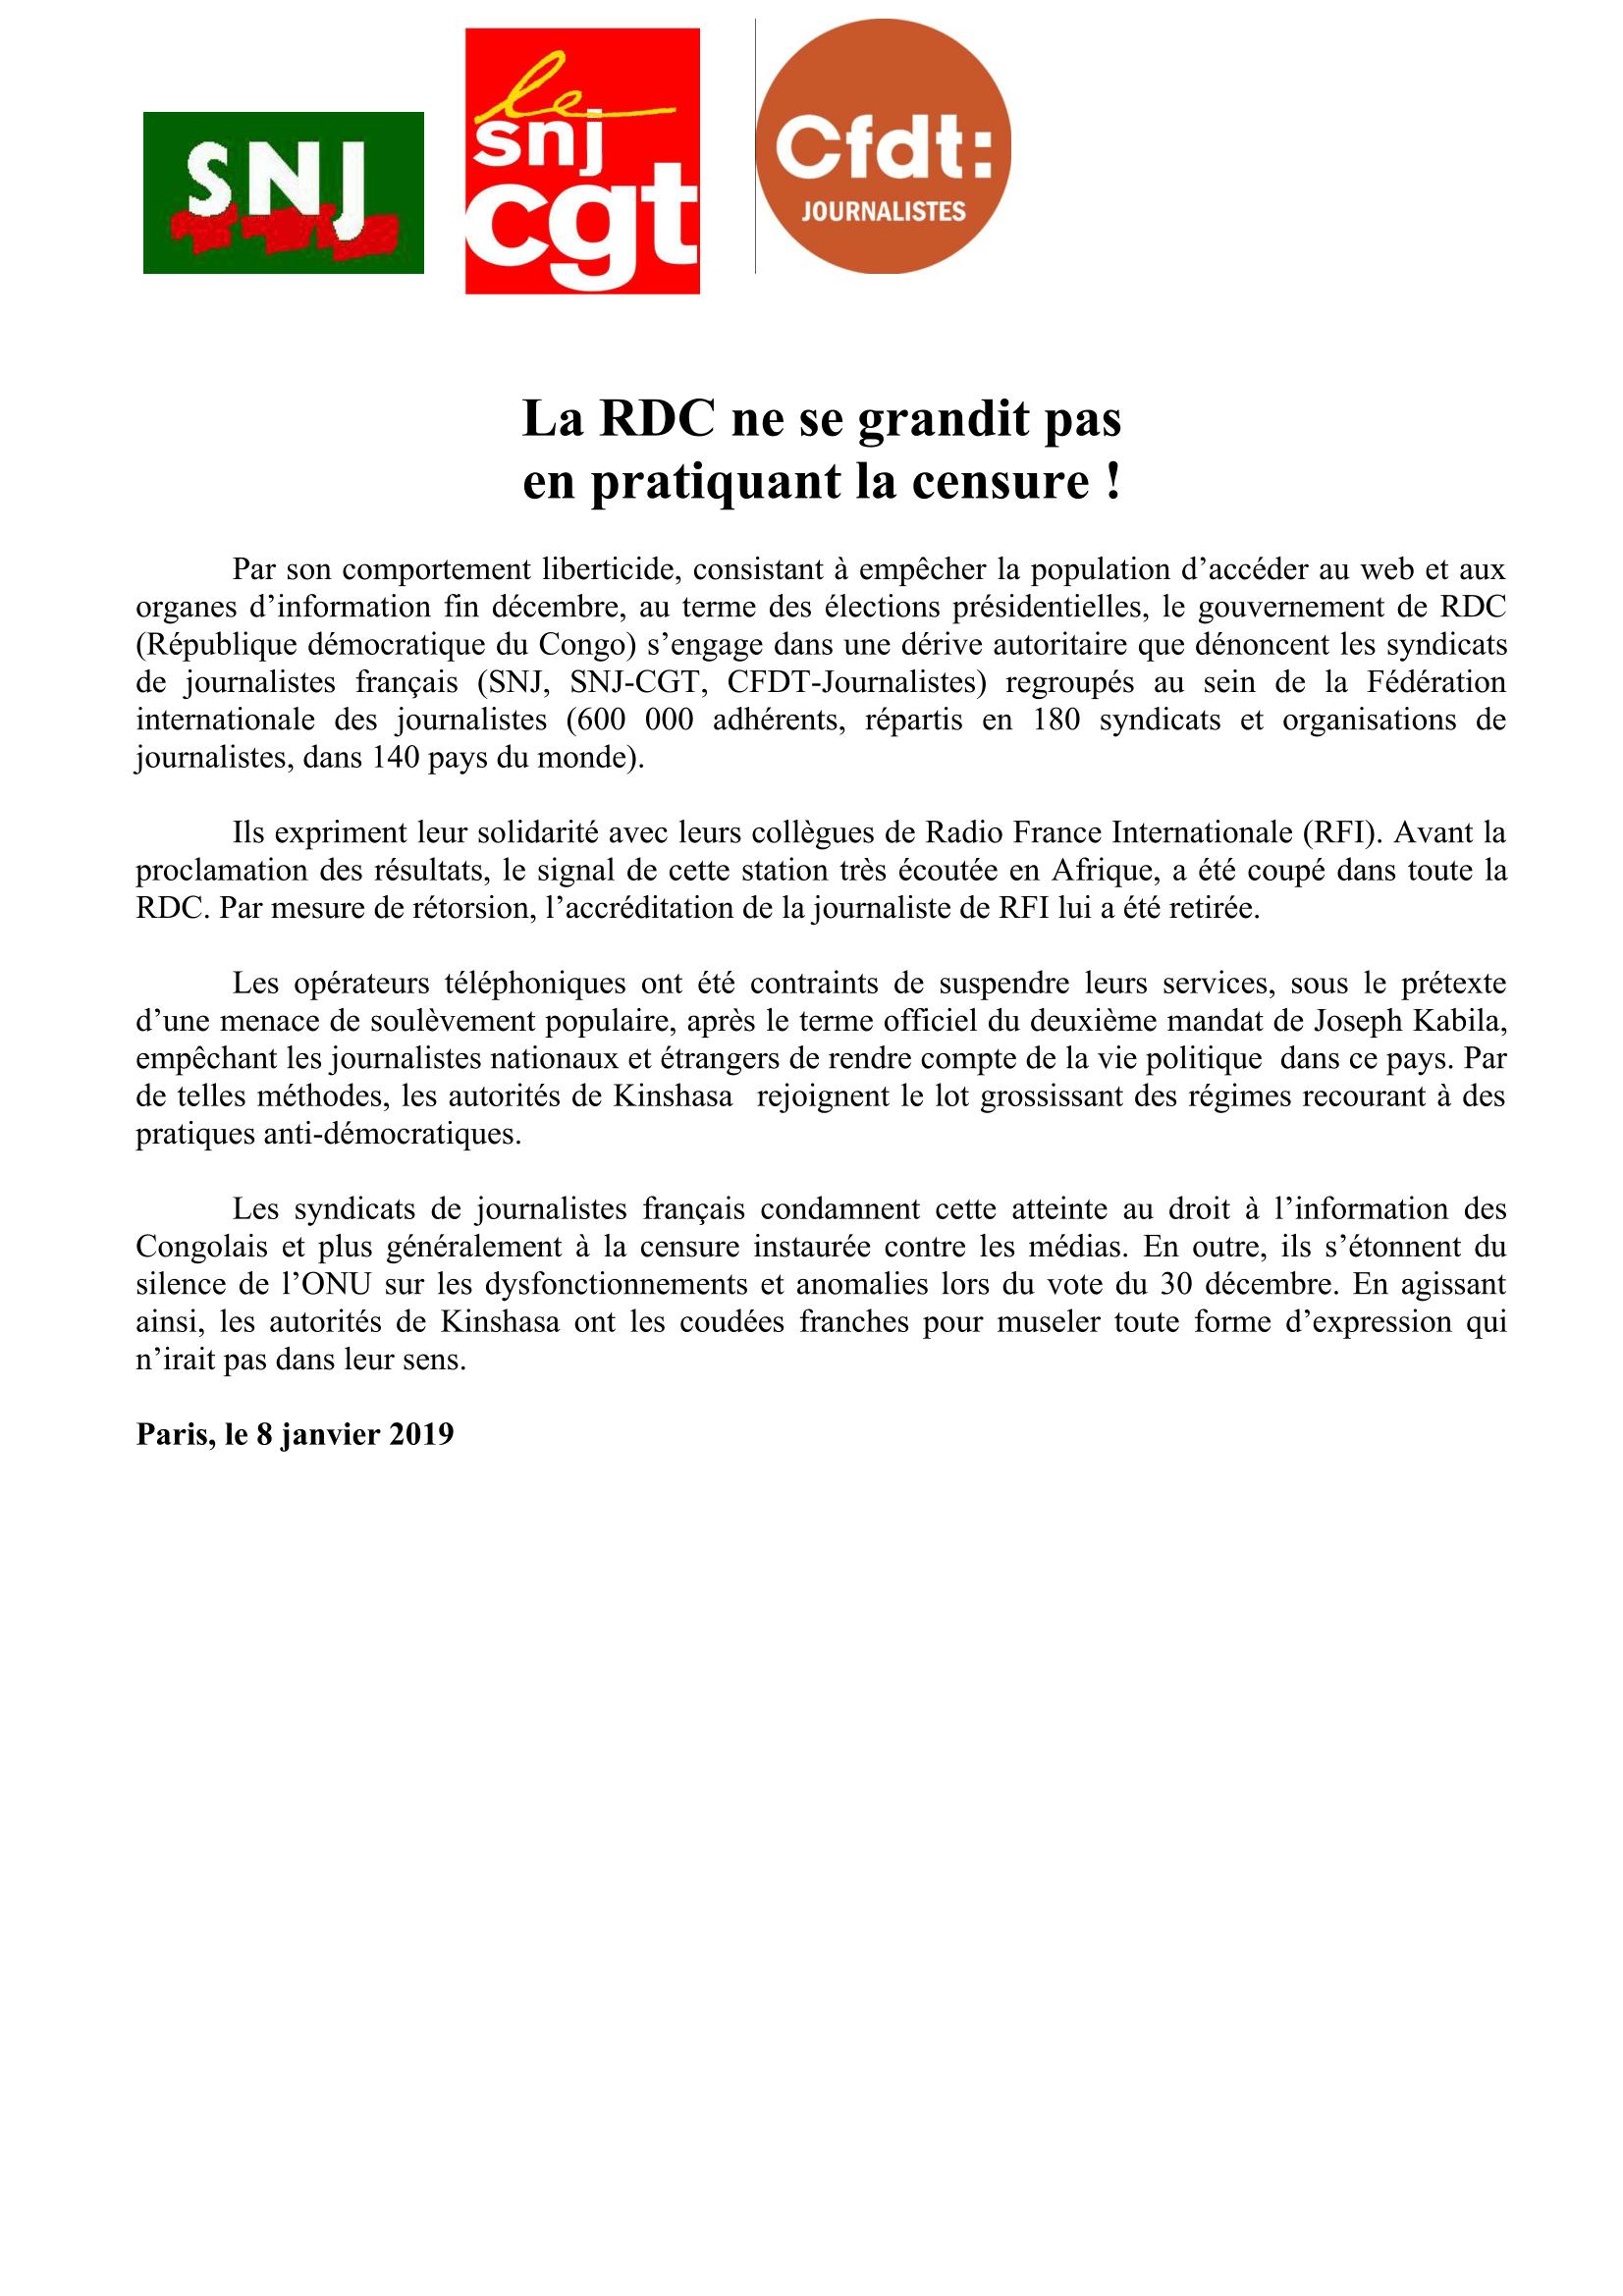 communique-intersyndical-rdc-pdf-8-janv-2019-1